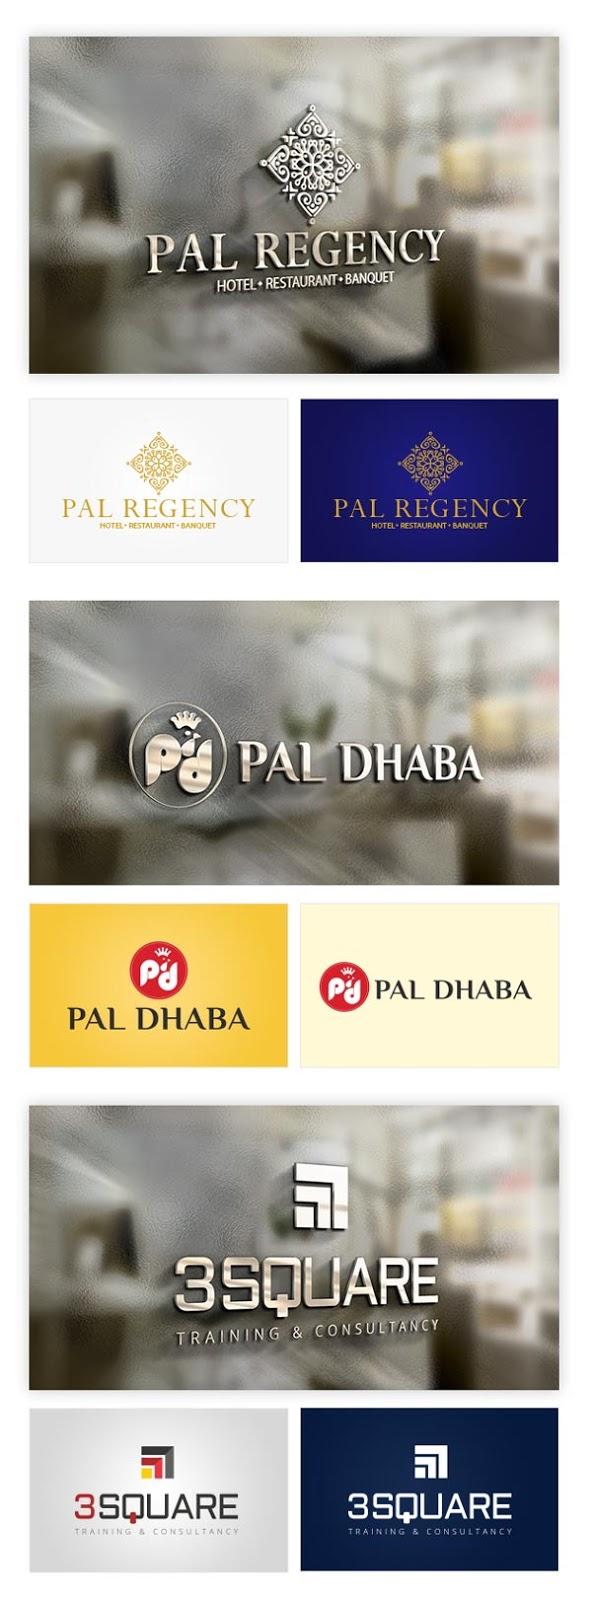 Logo designing Company Chandigarh